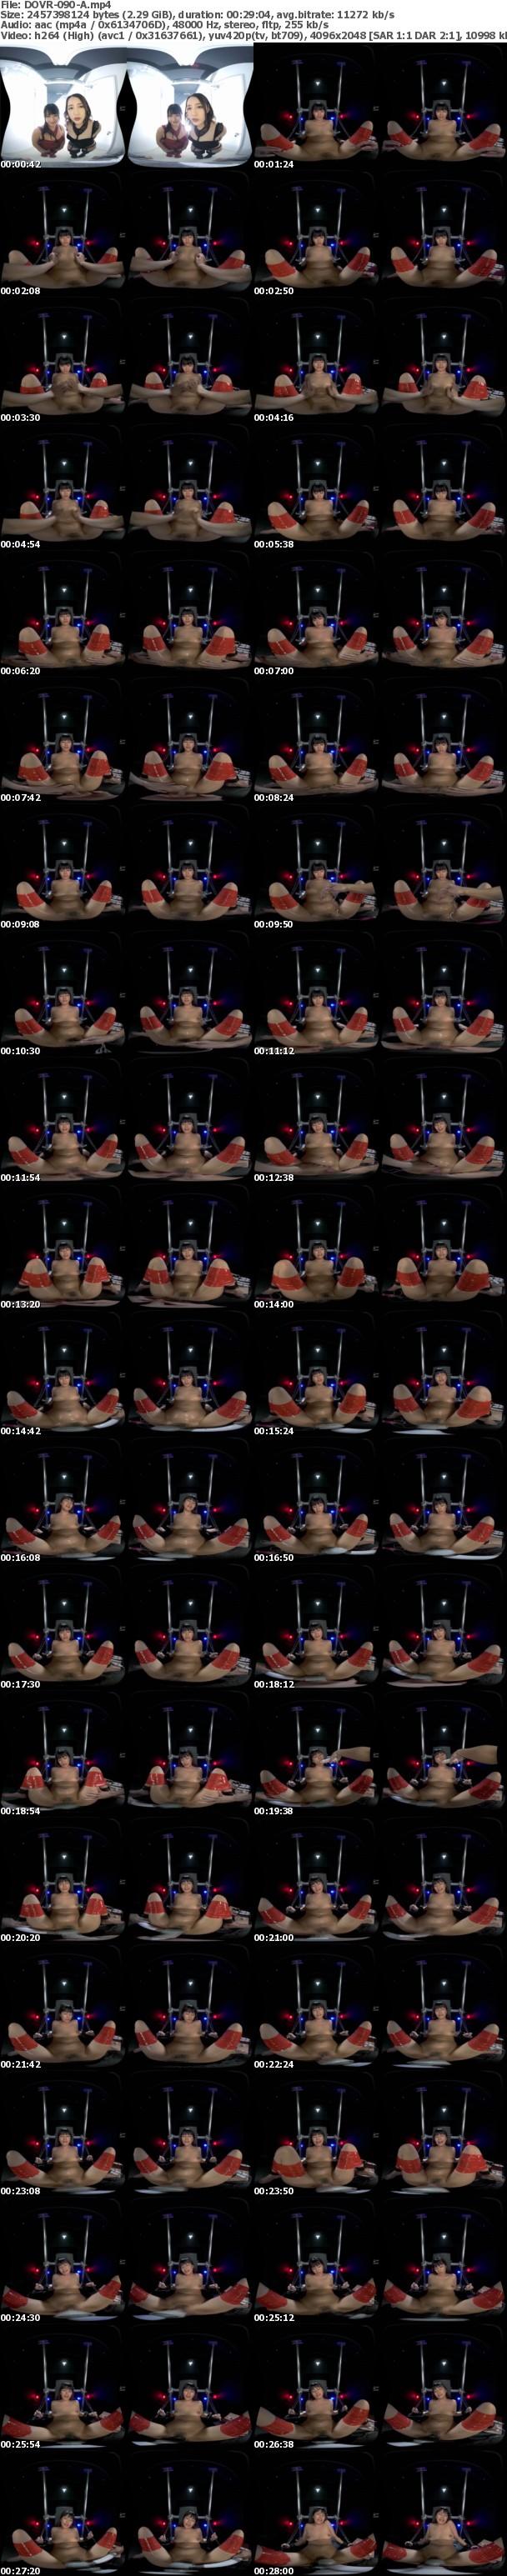 (VR) DOVR-090 【まとめ買い特典あり】SとM男 ようこそ!私たちの館へ 私たちがあなたの欲望をかなえます!美咲かんな・如月夏希